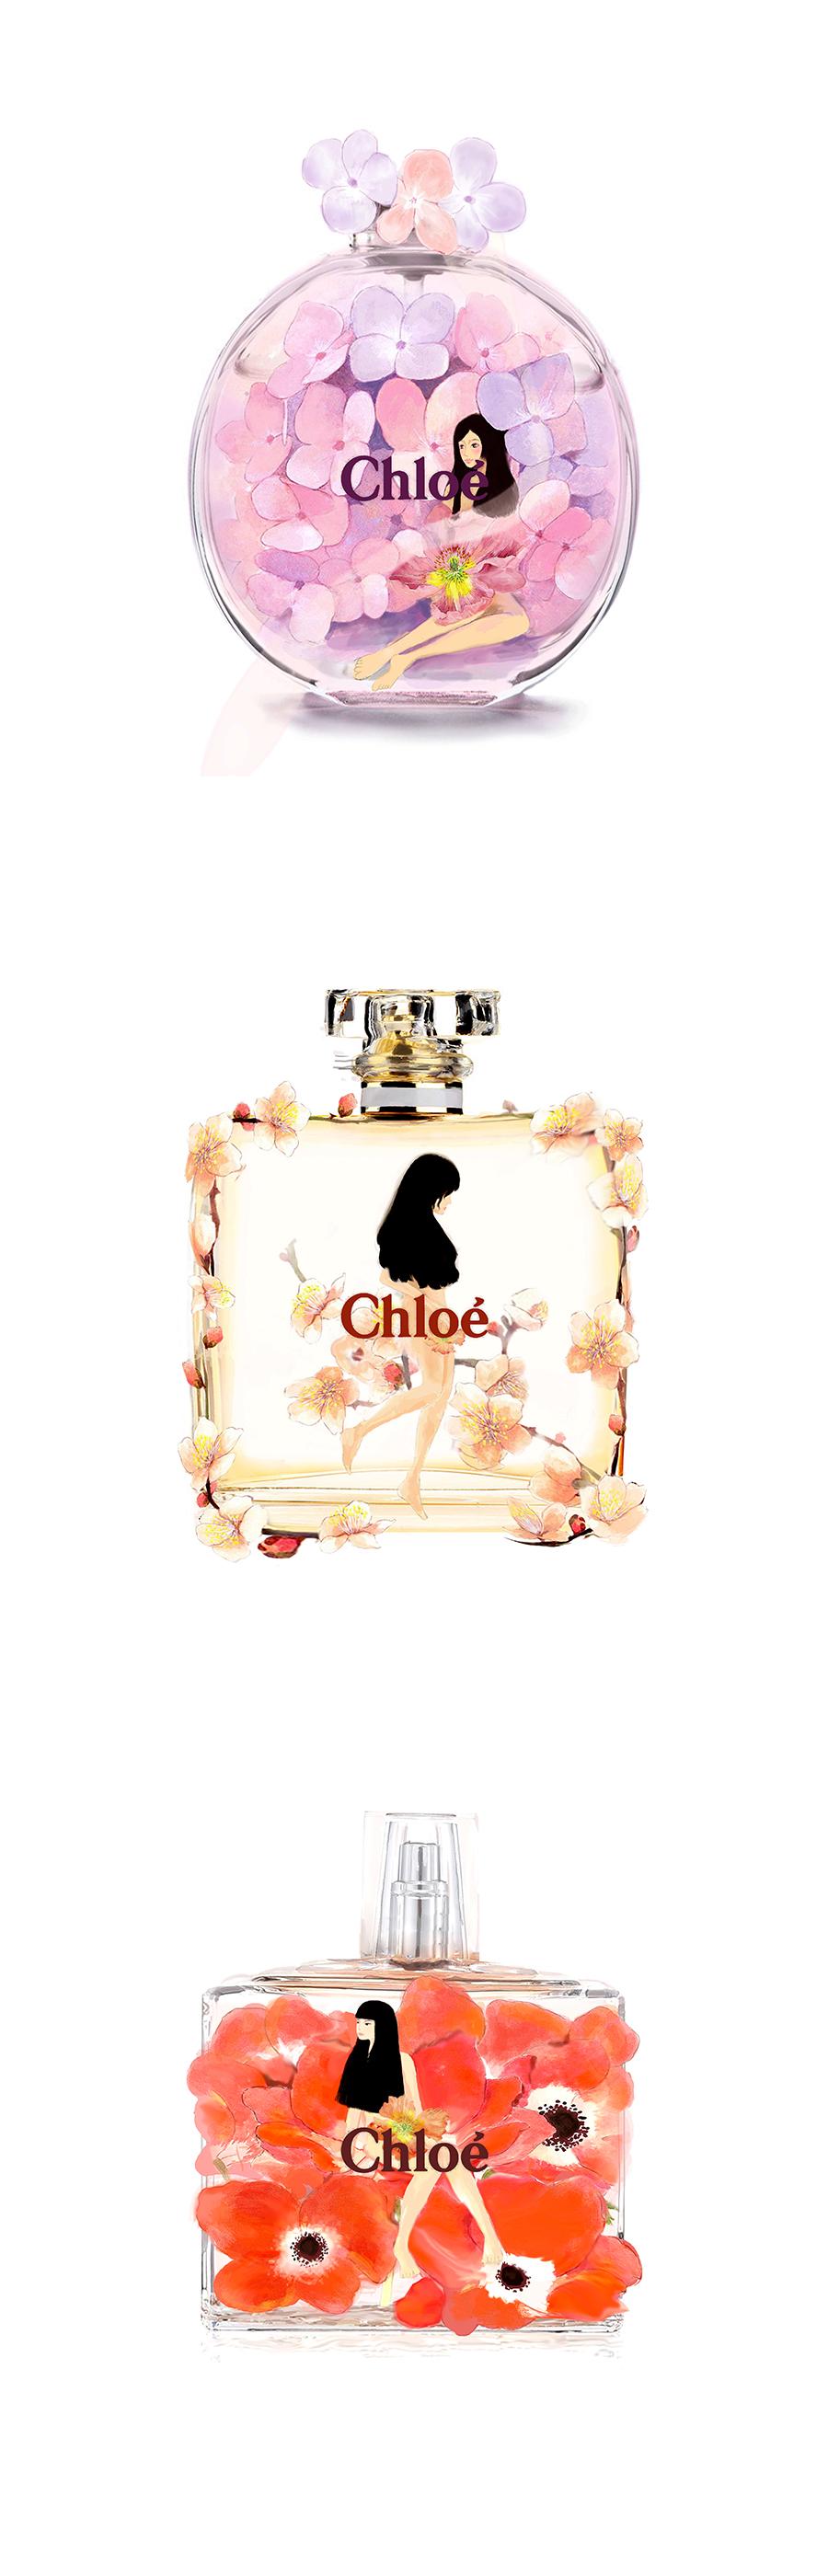 chloe香水手绘||商业插画|插画|cheeriovivi - 原创